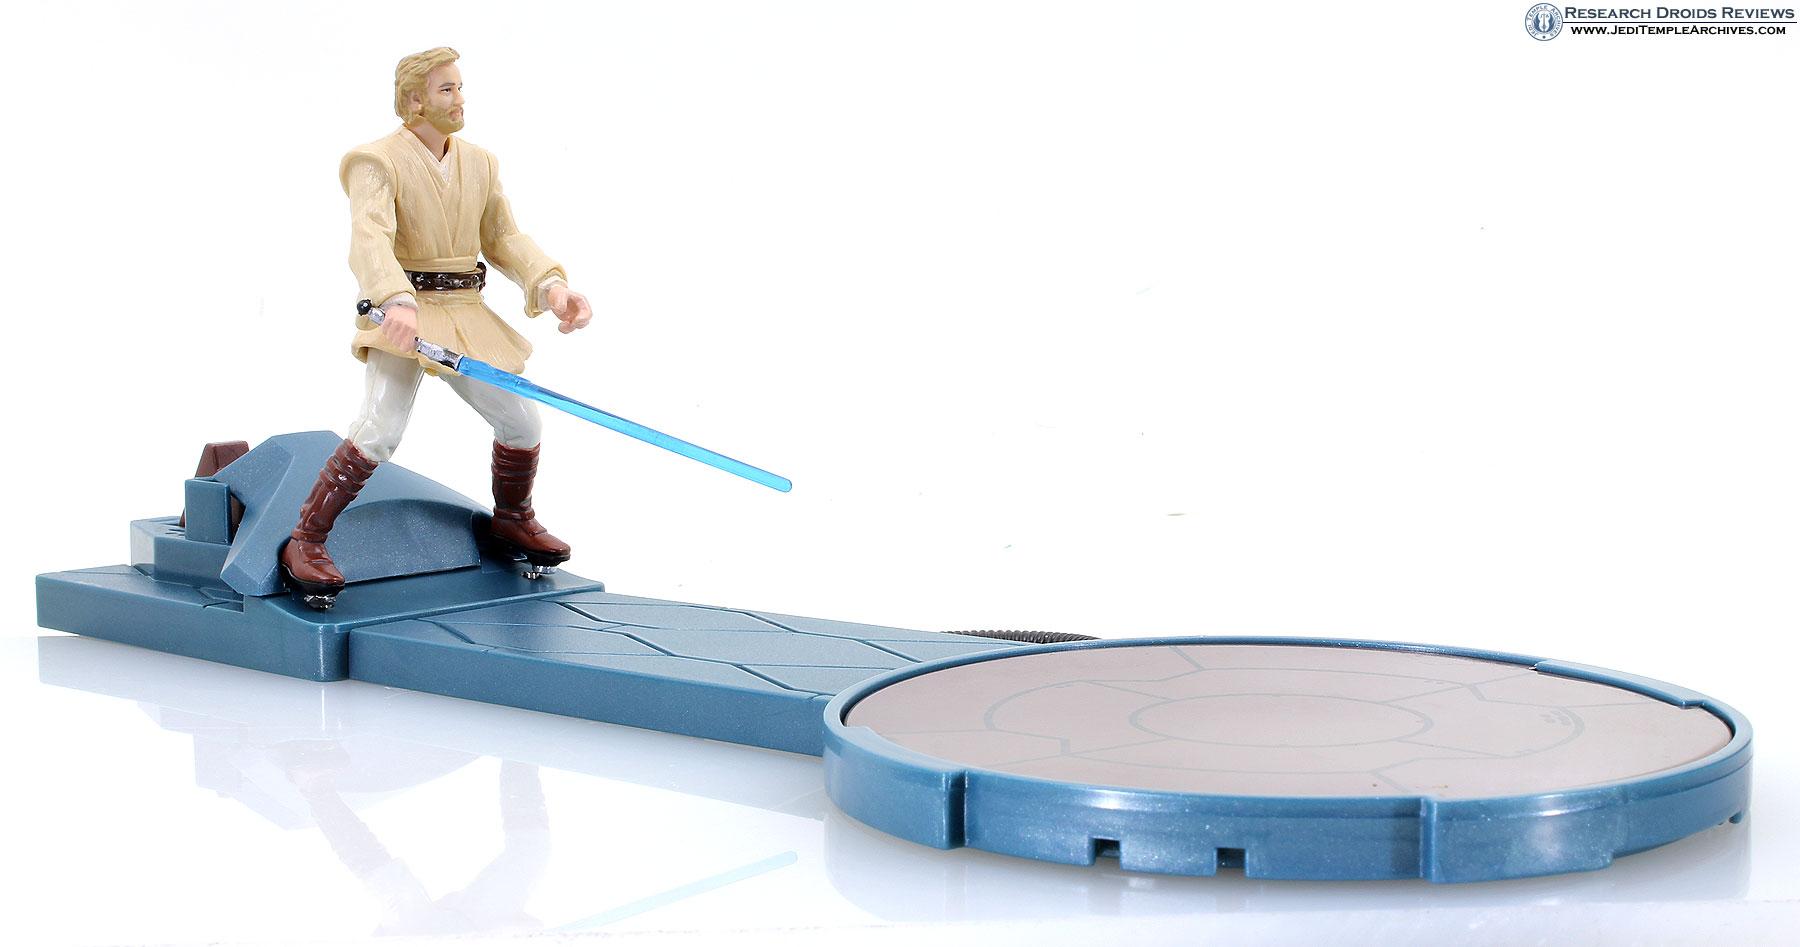 Obi-Wan Kenobi w/ Force Flipping Attack